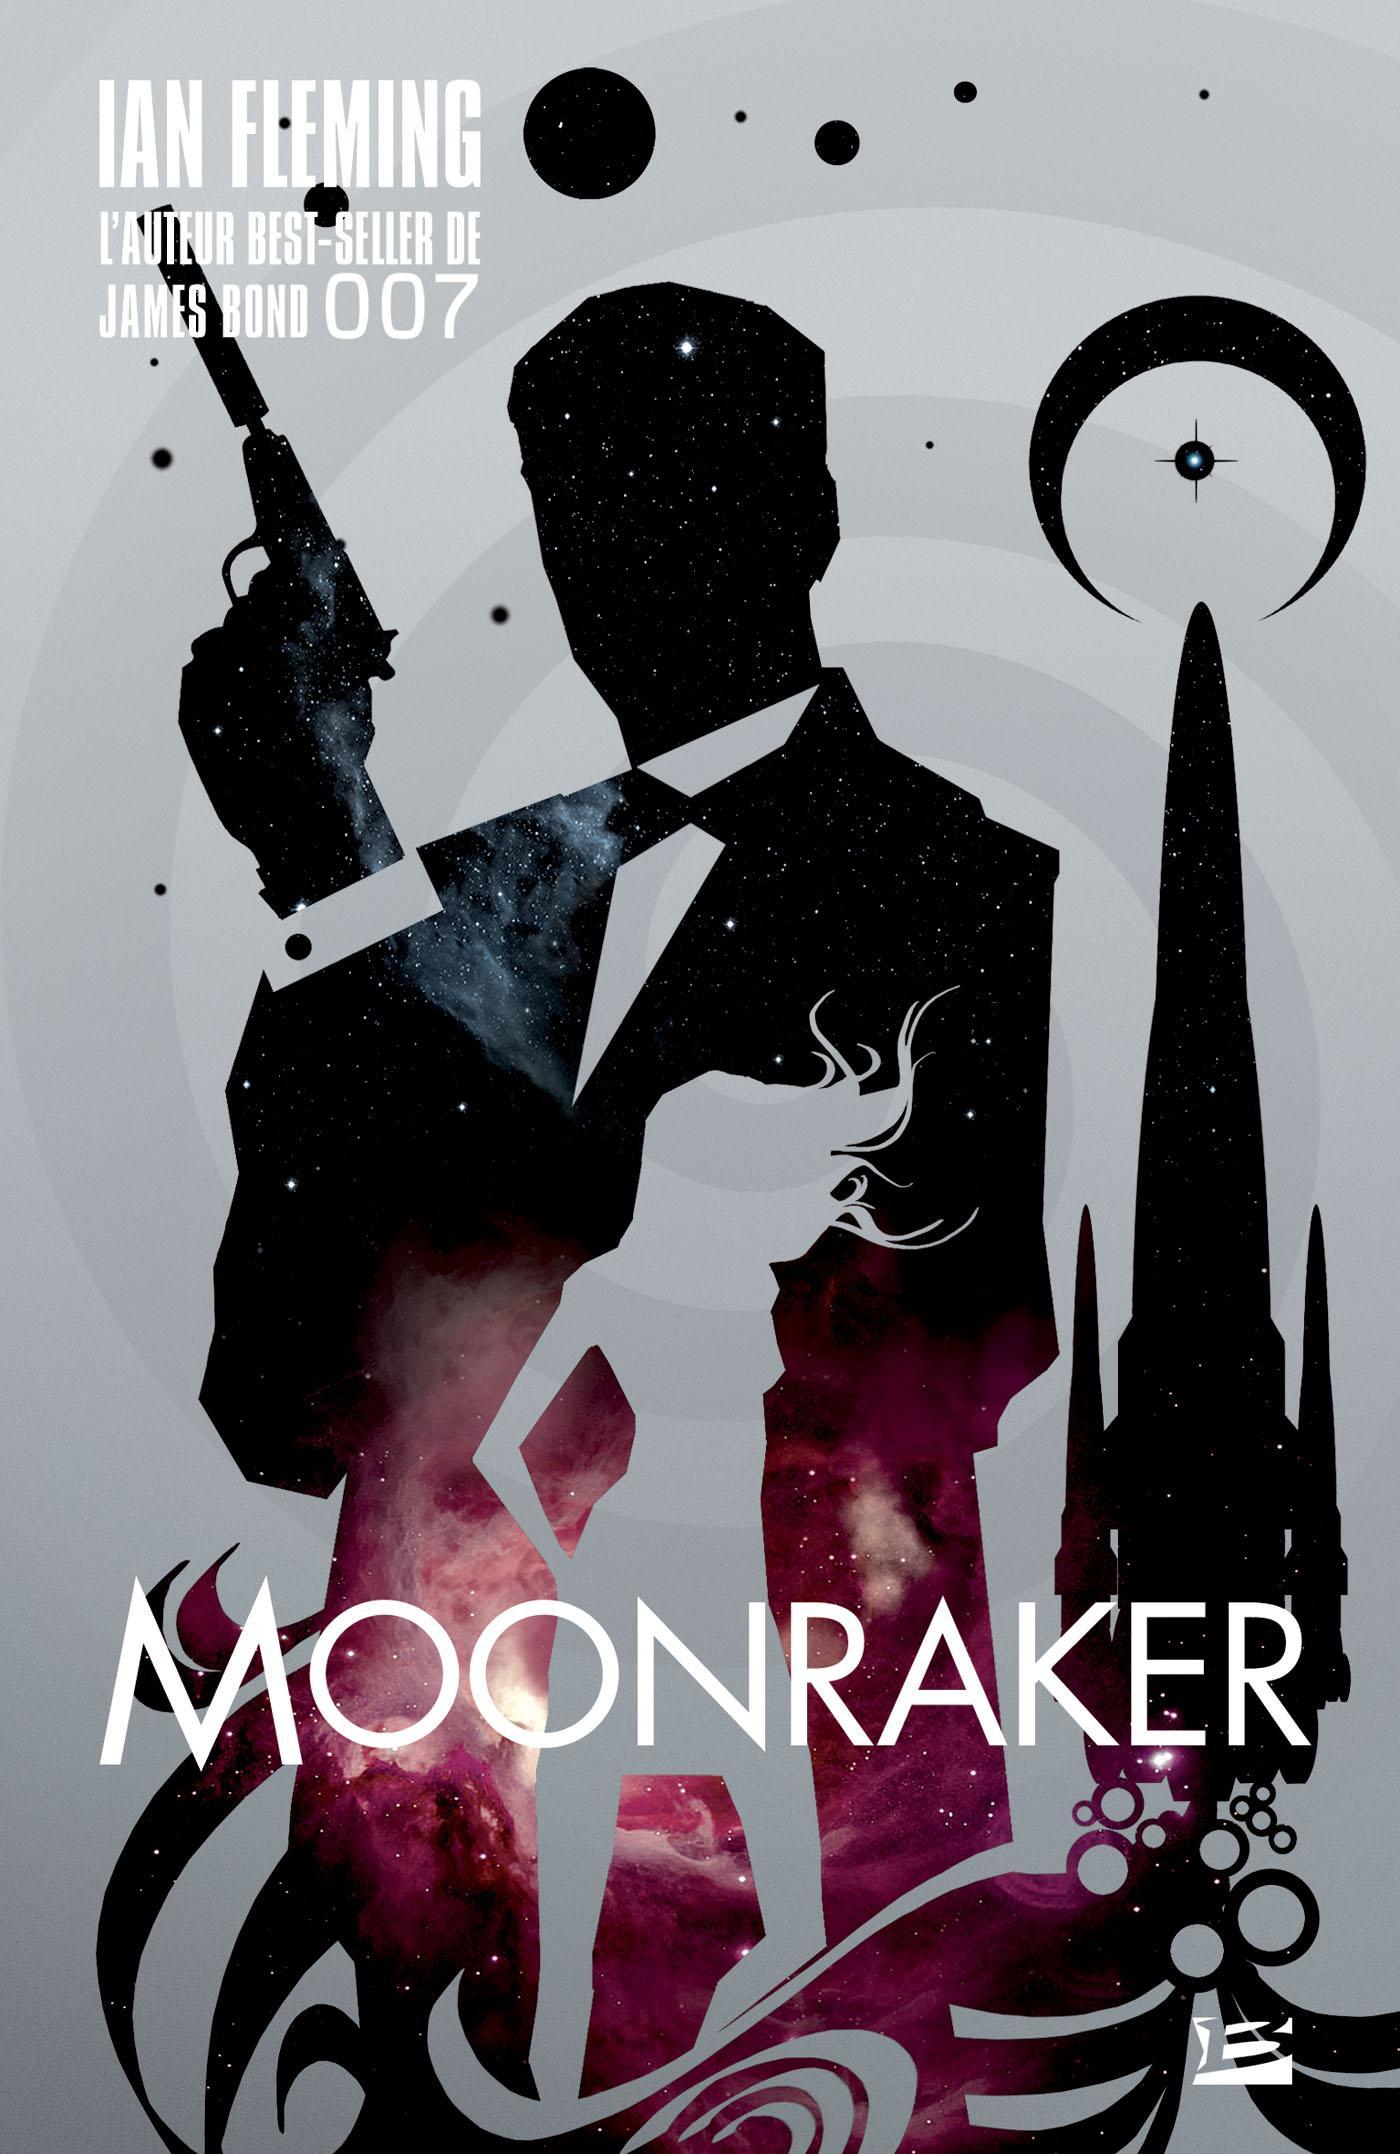 Moonraker, JAMES BOND 007